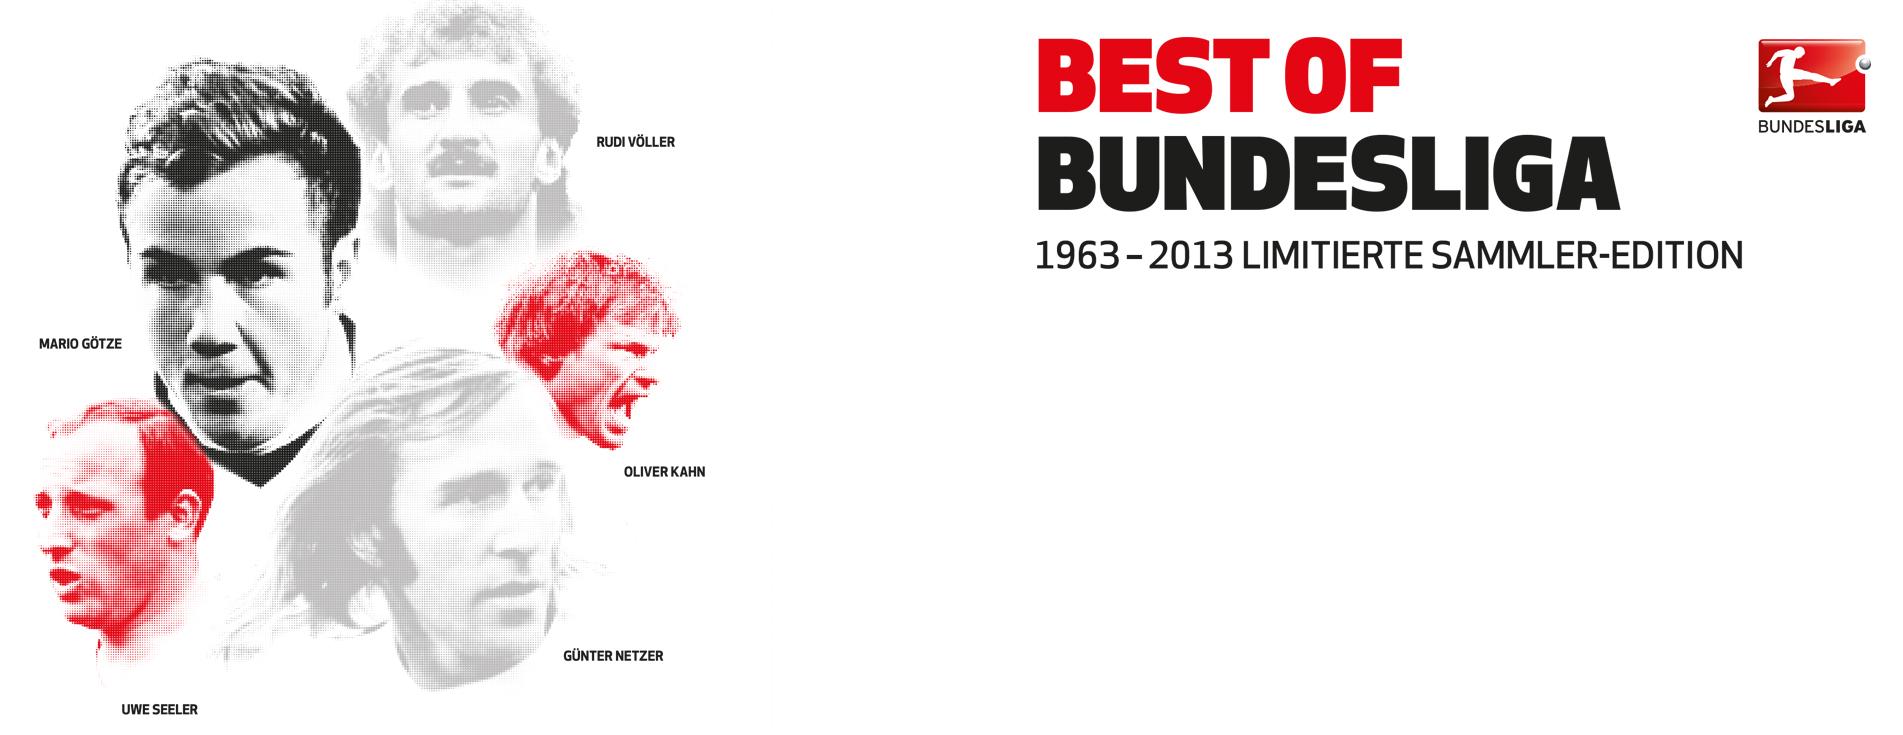 Best of Bundesliga 1963-2013